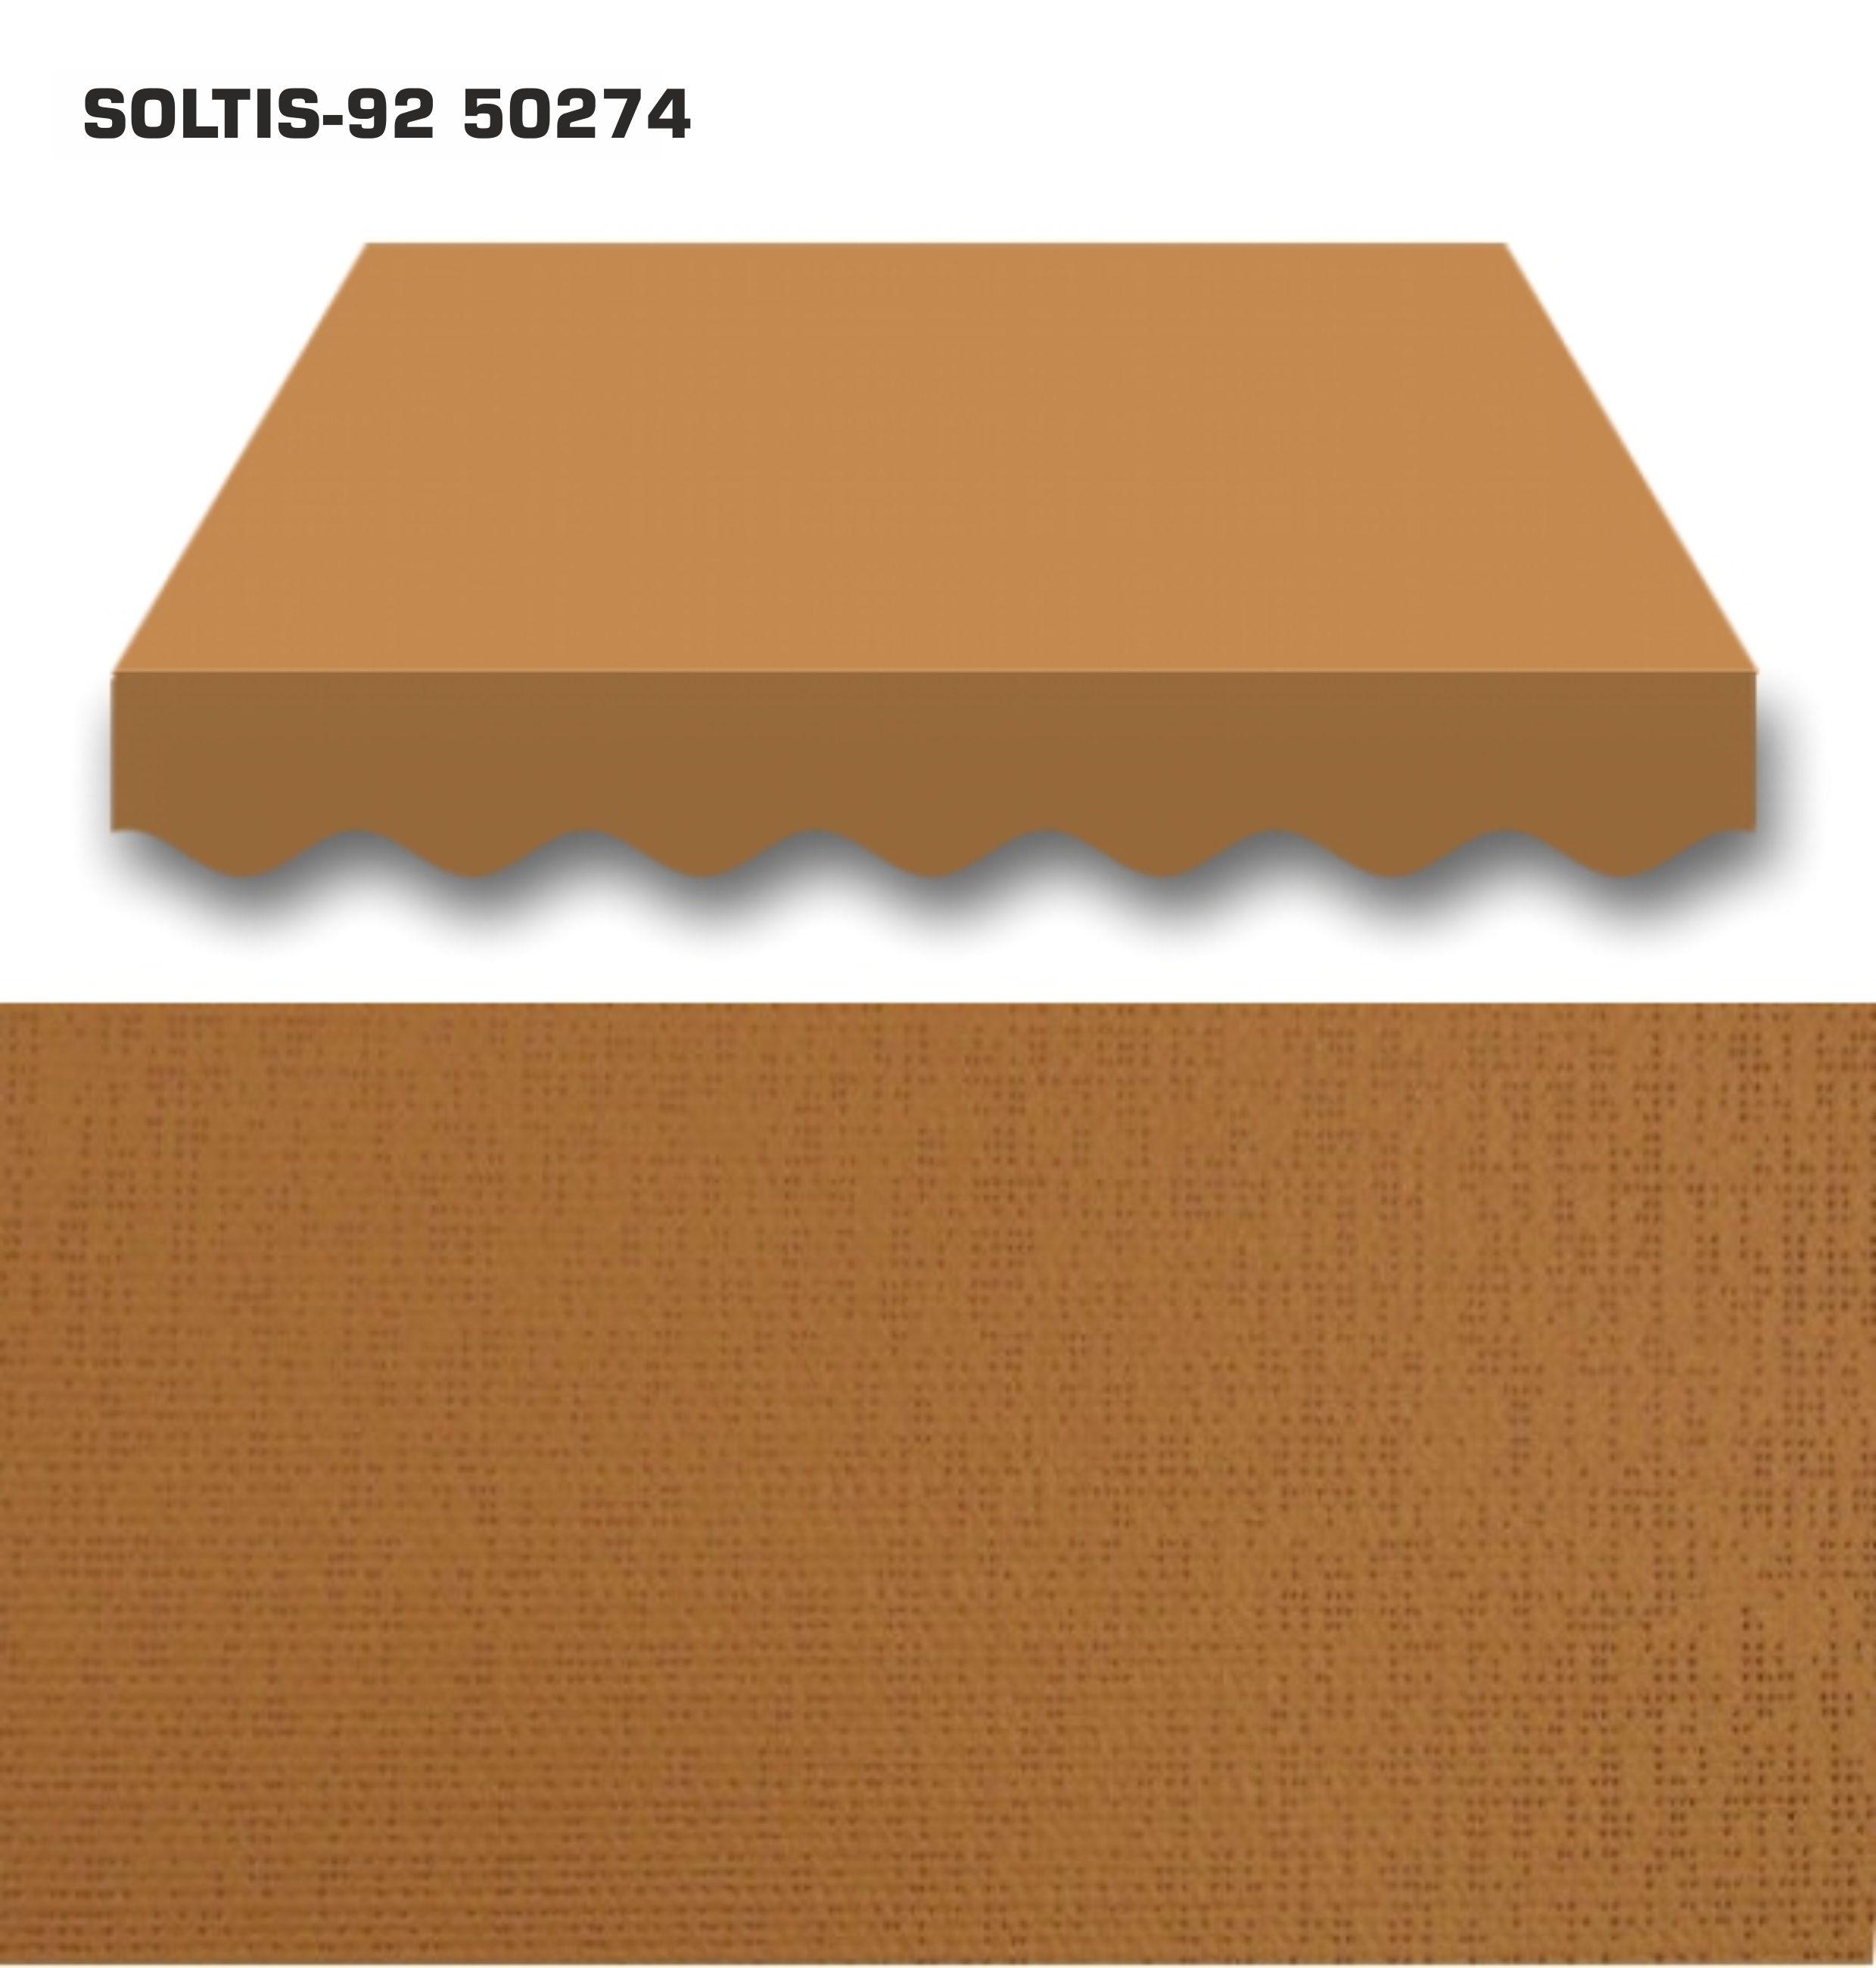 Soltis-92 50274